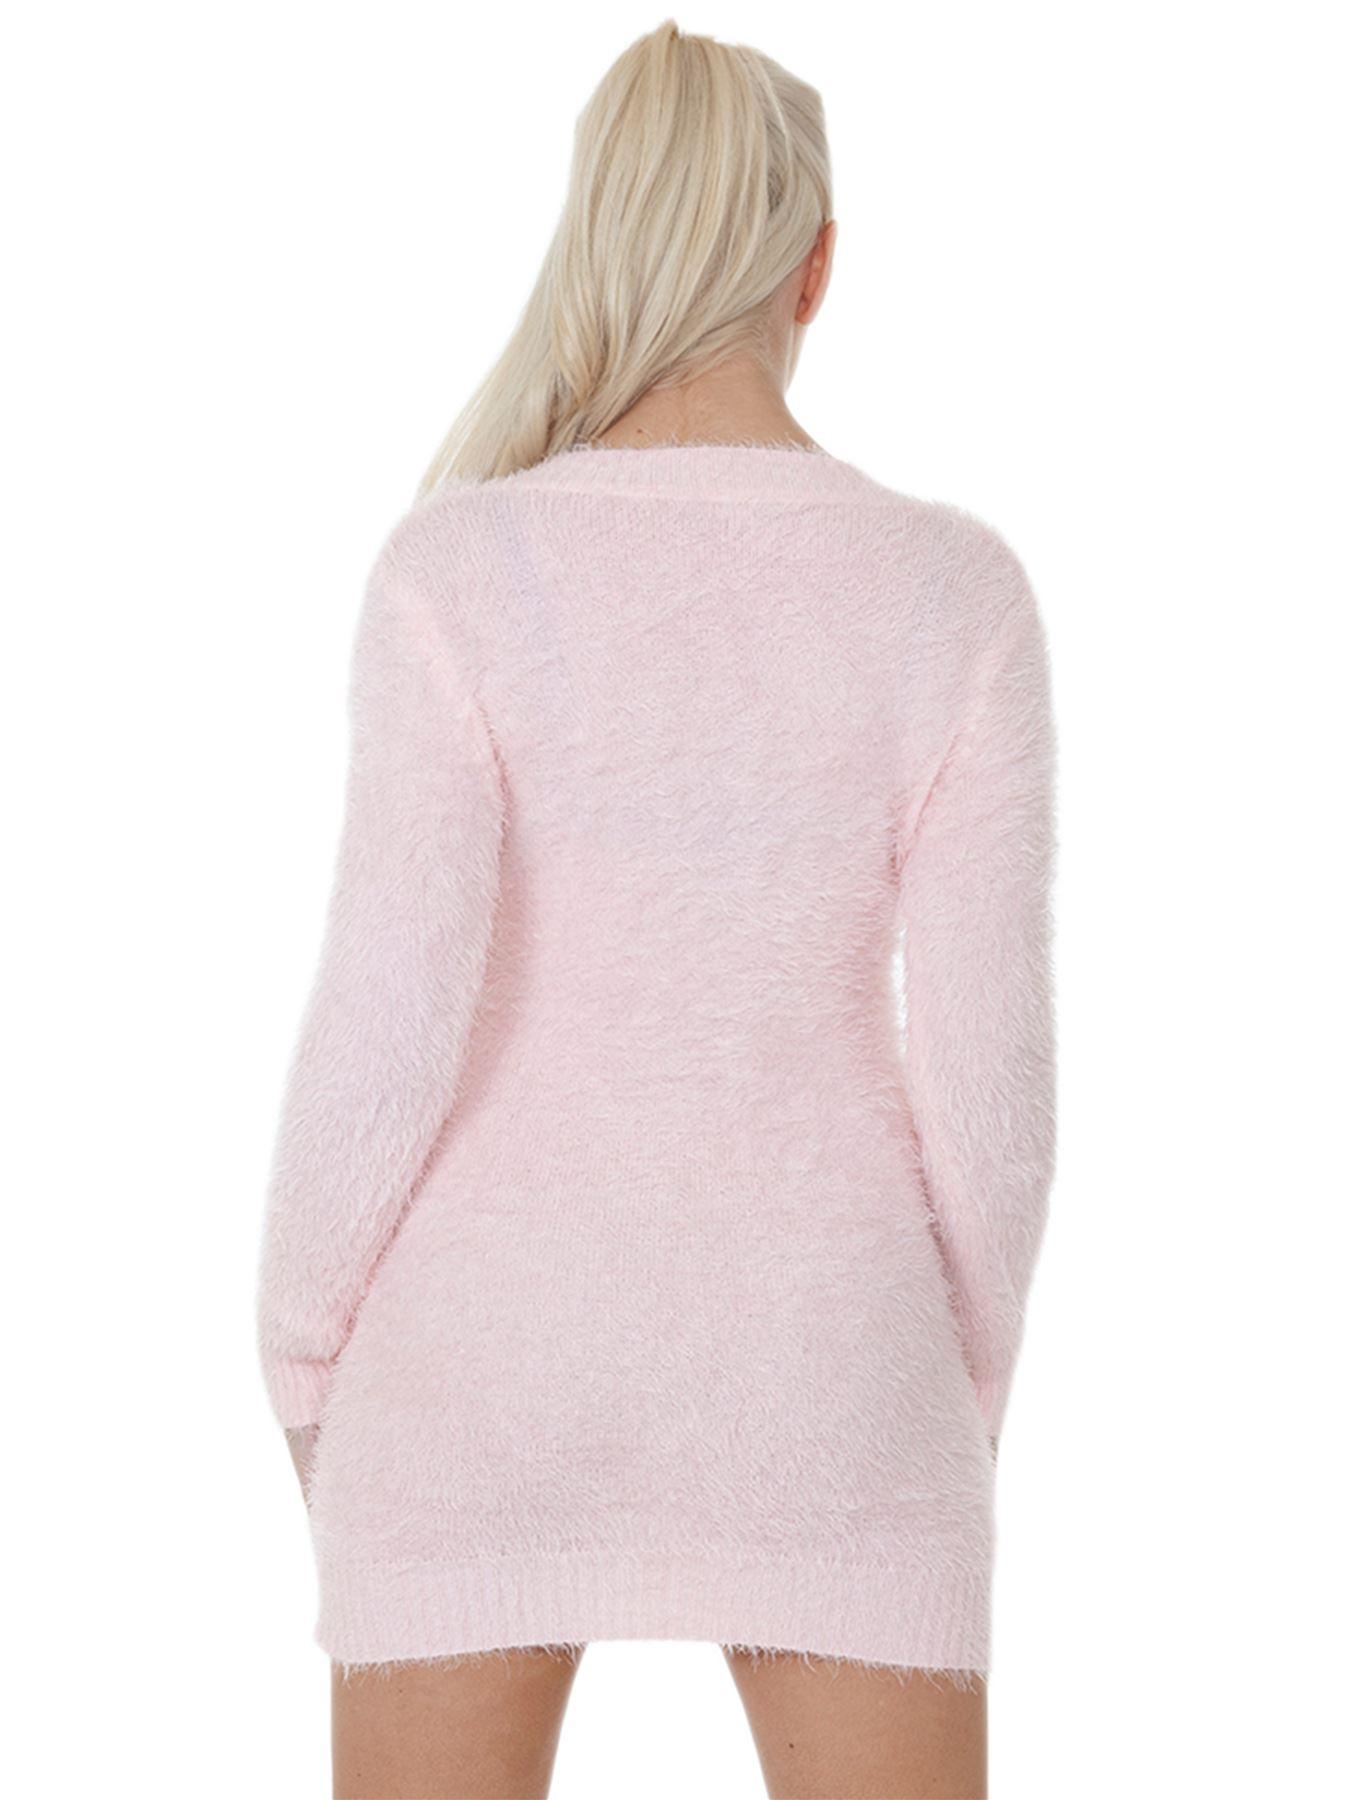 Pull-Femme-Femmes-Tricote-Cardigans-Plain-Tricot-Moelleux-Col-V-Manches-Longues miniature 26